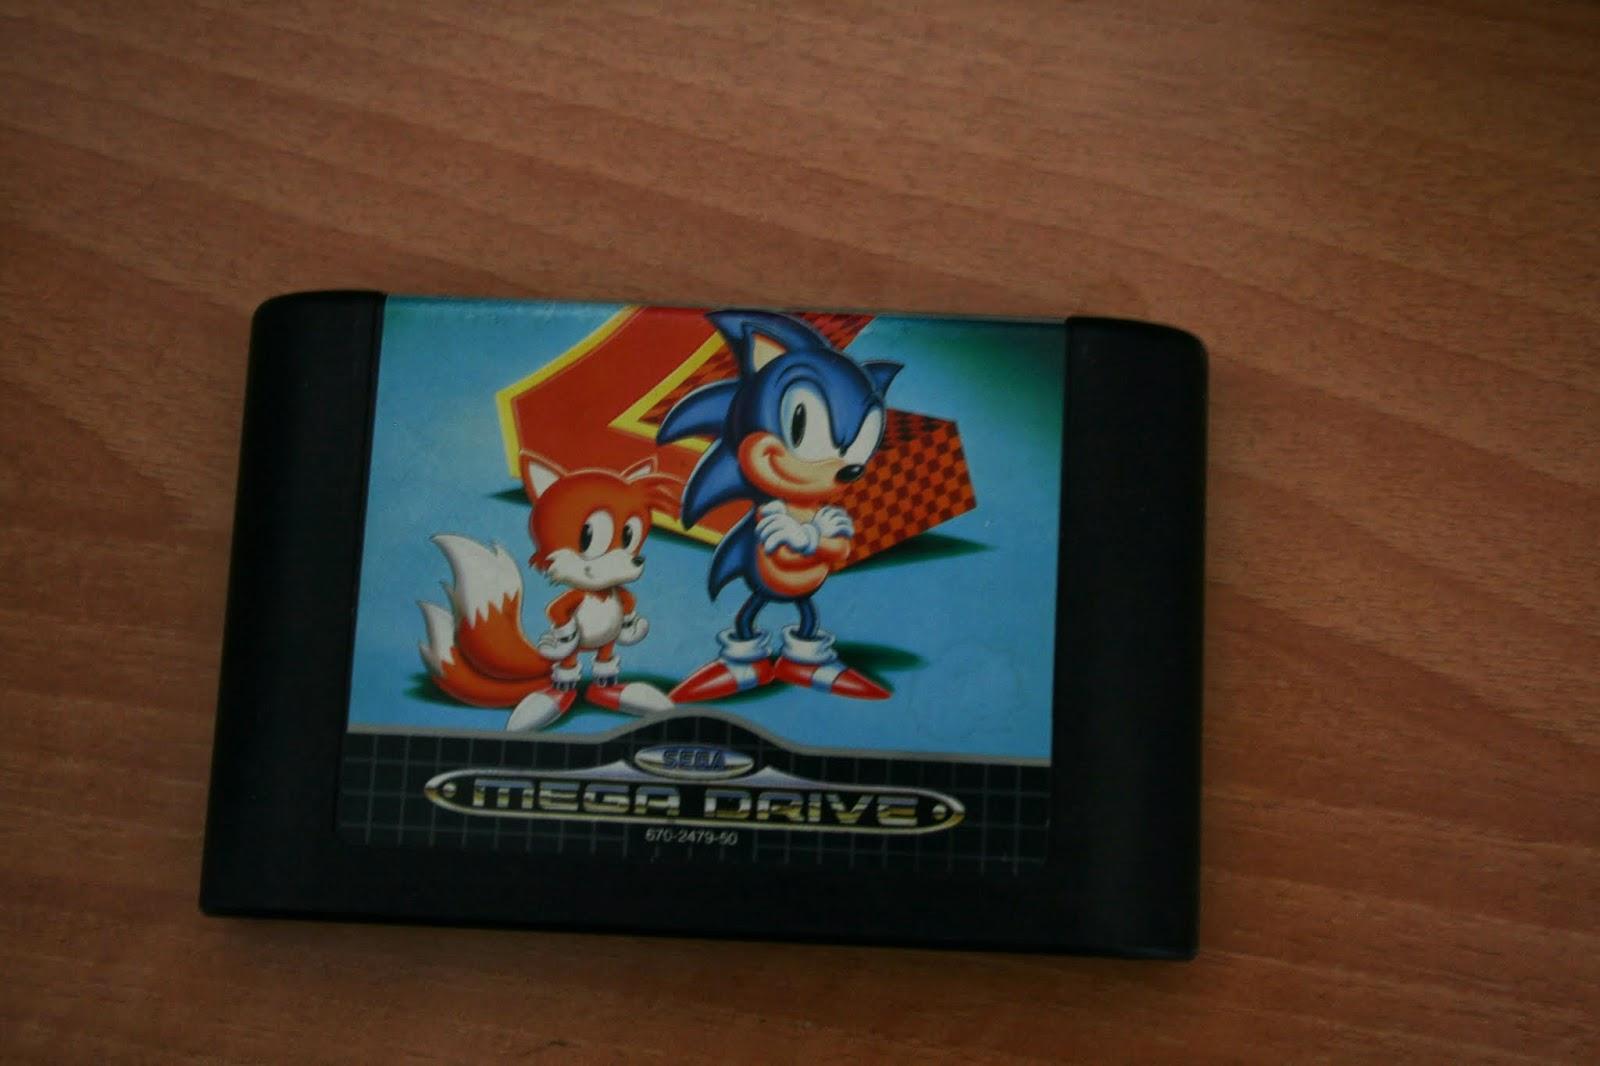 Sonic the hedgehog 2 for Mega Drive